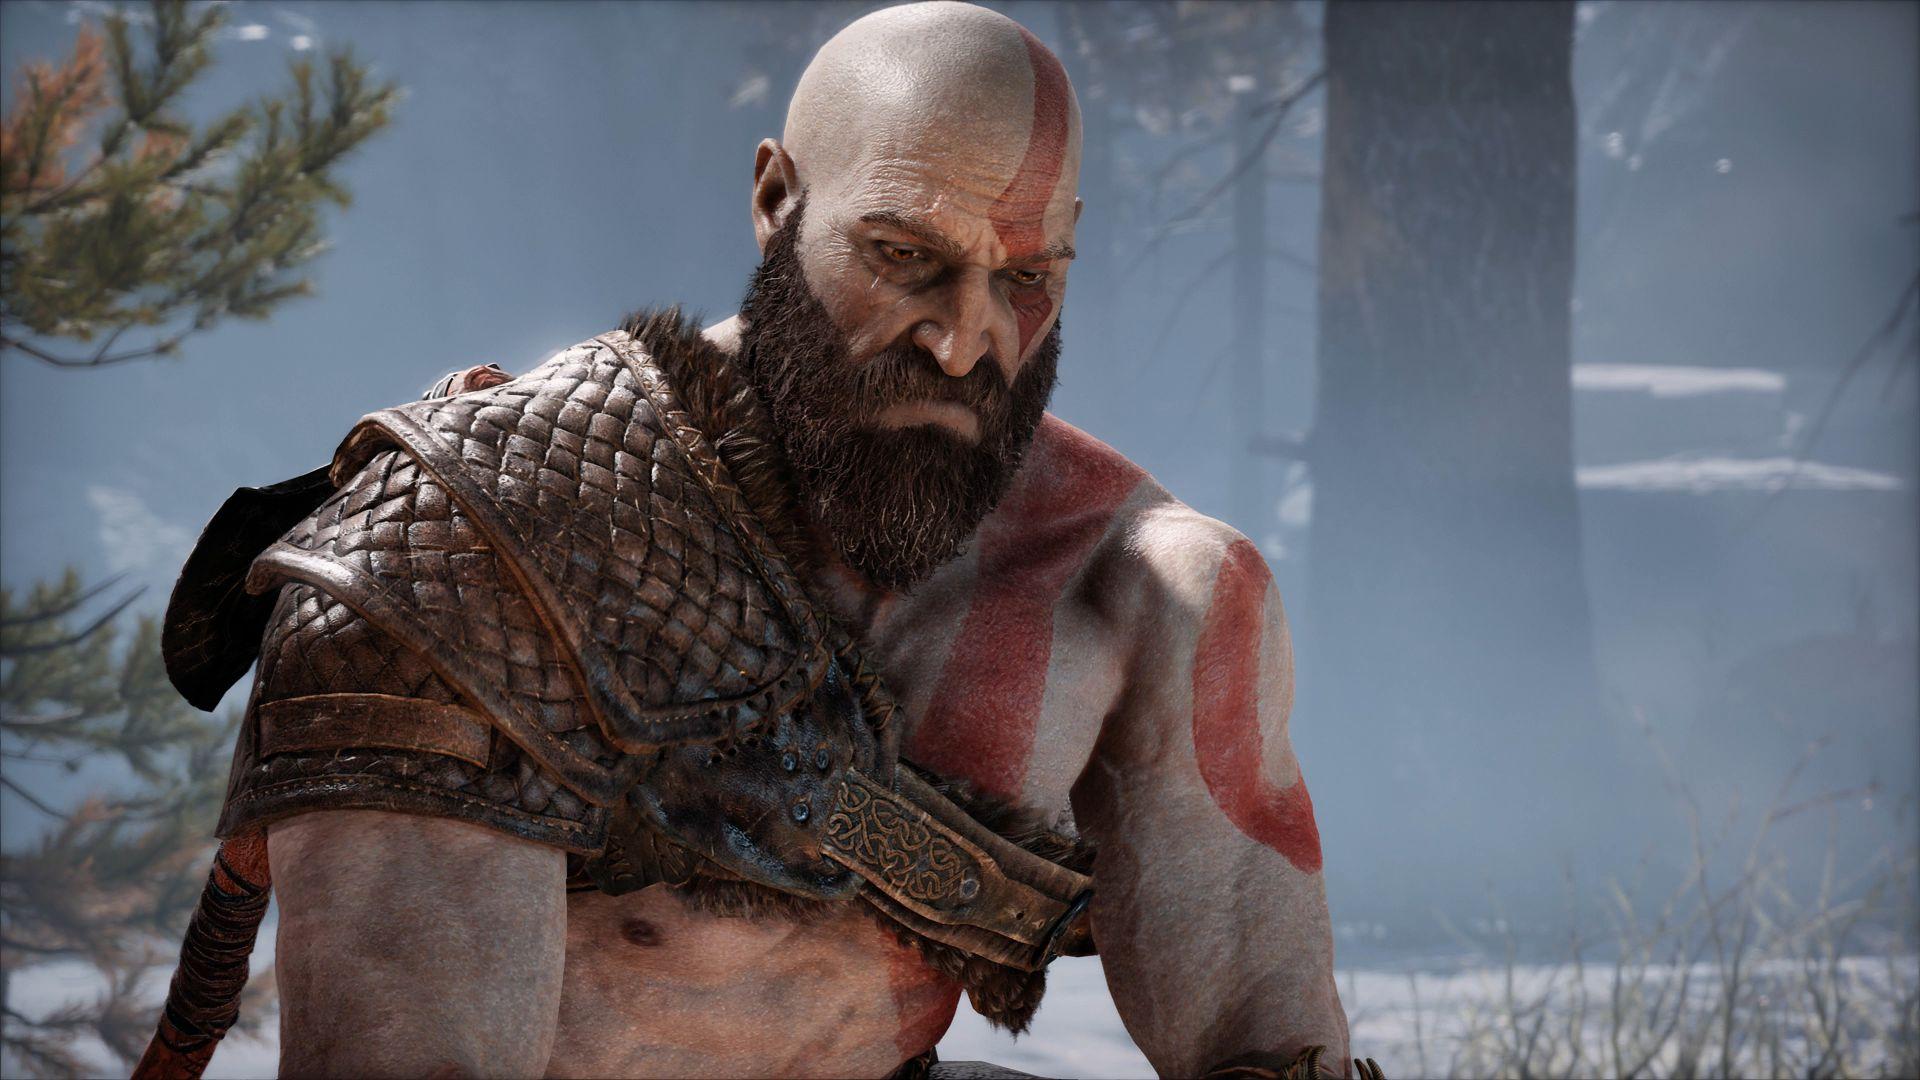 Watch God of War Documentary 'Raising Kratos' now